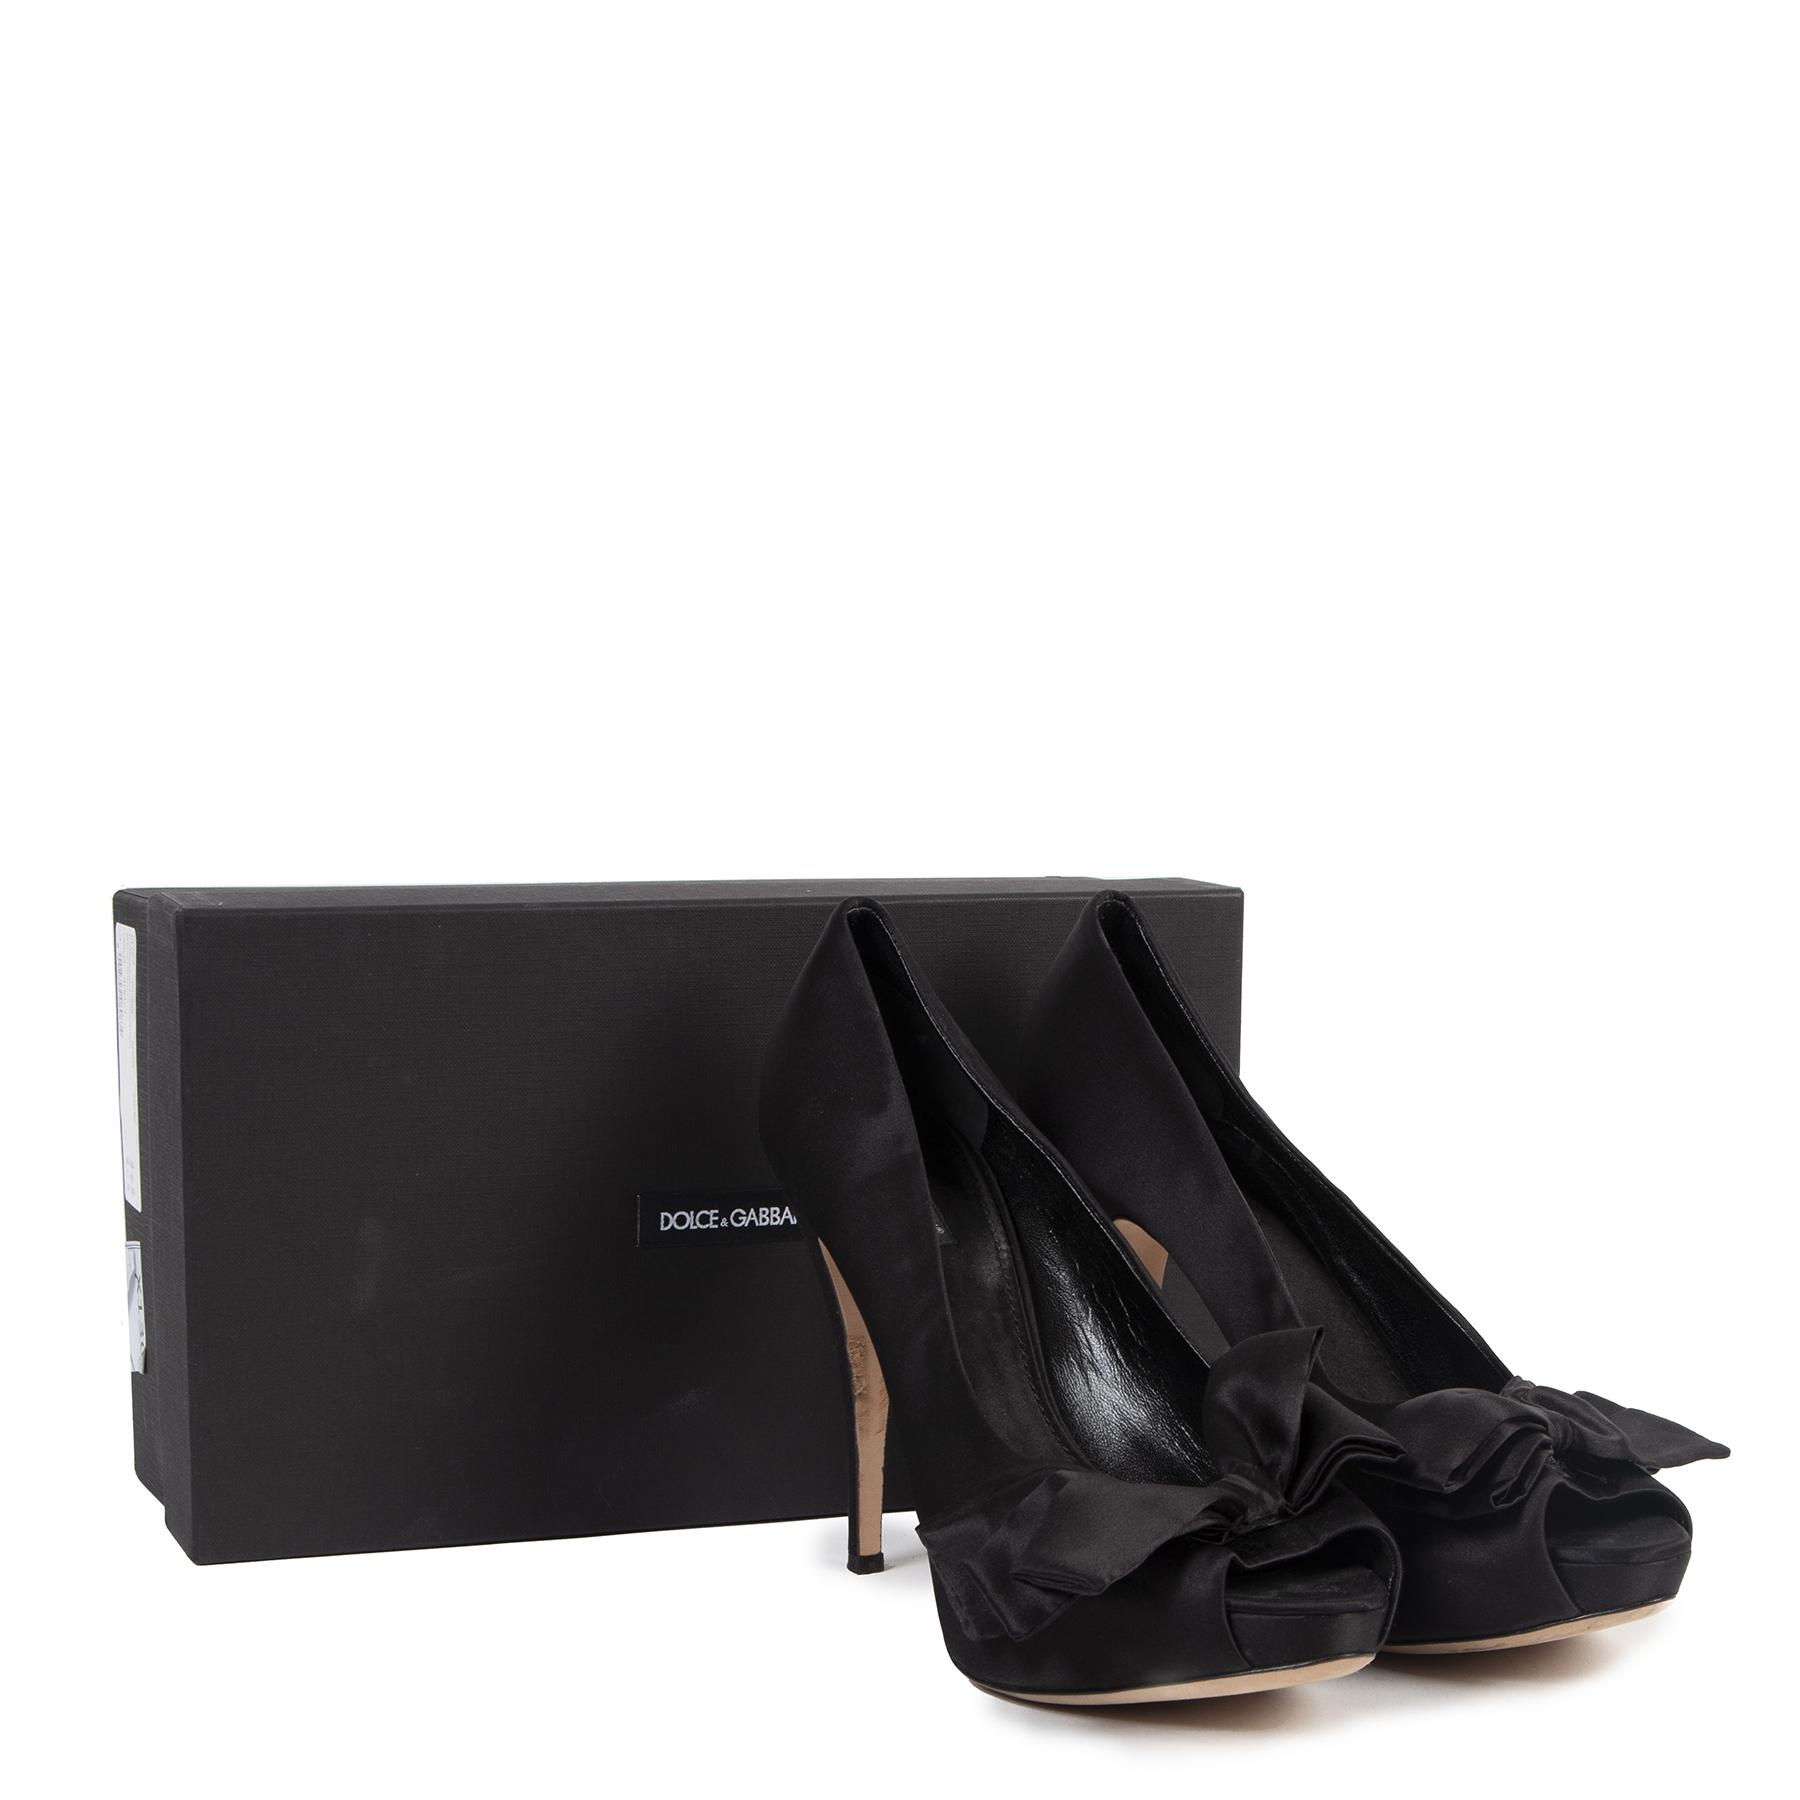 Authentieke tweedehands vintage D&G Black Silk Pumps - Size 40 koop online webshop LabelLOV